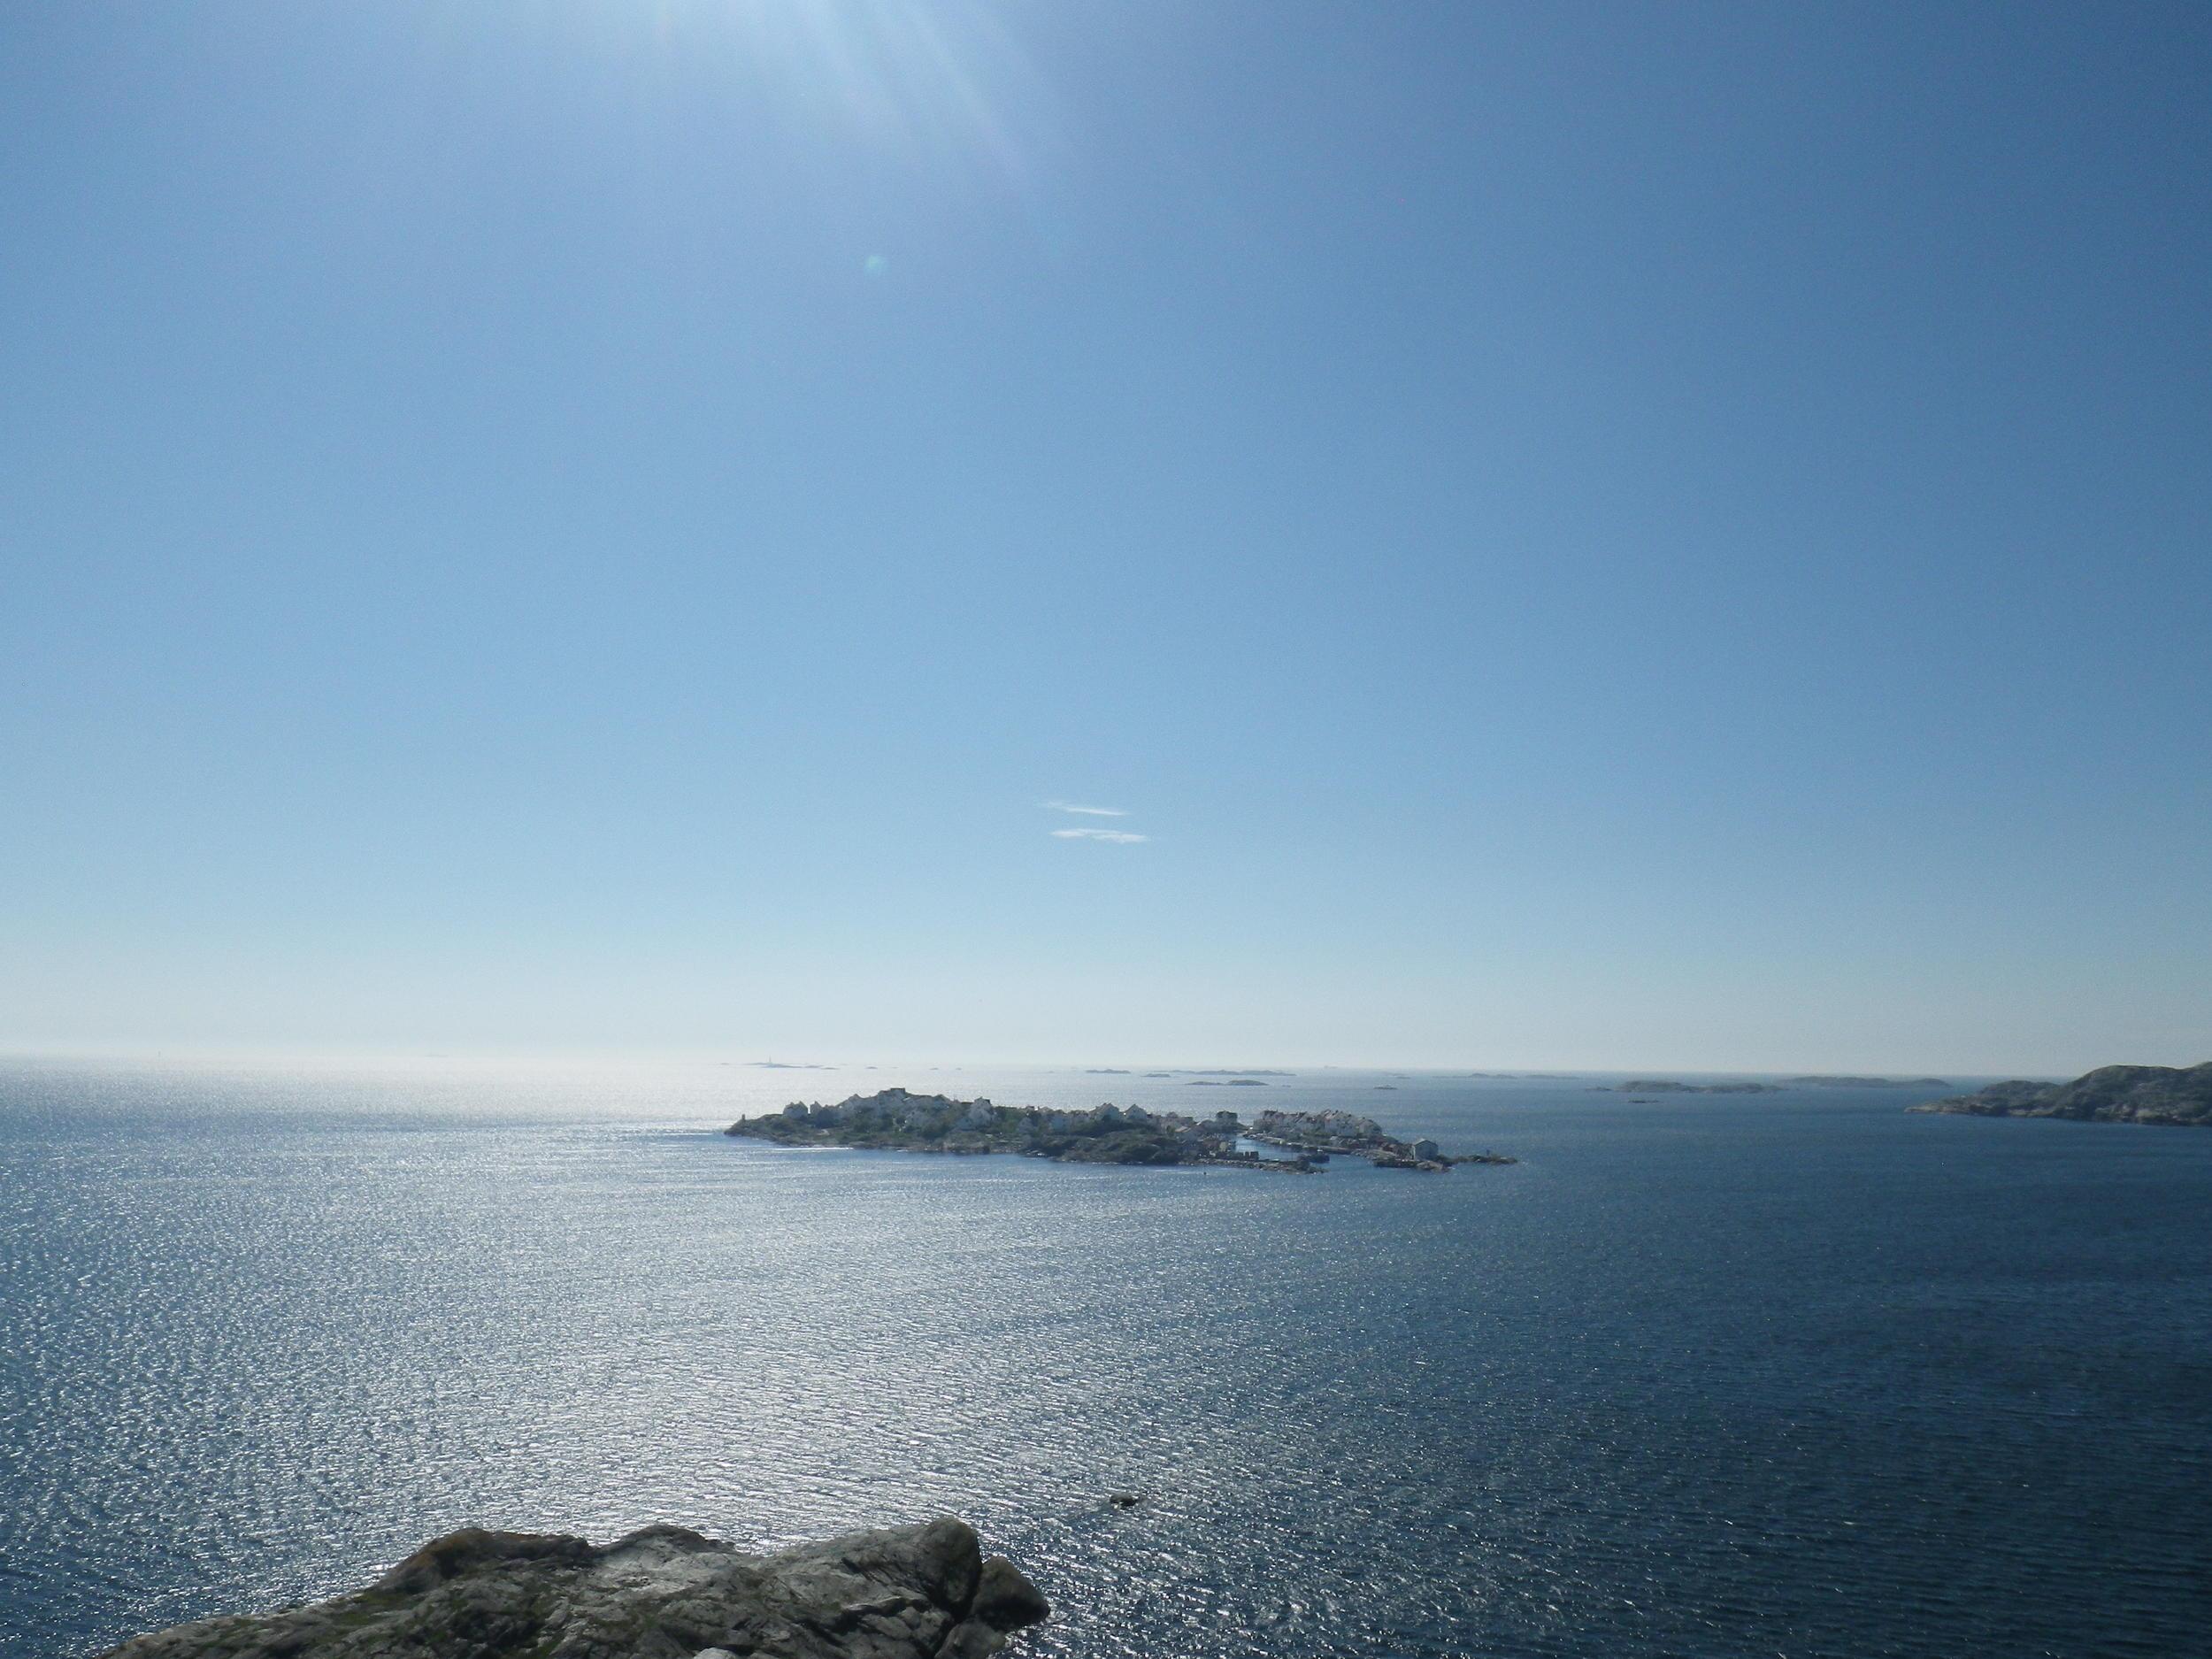 The island of  Å stol, as seen from the peaks of Dyrön